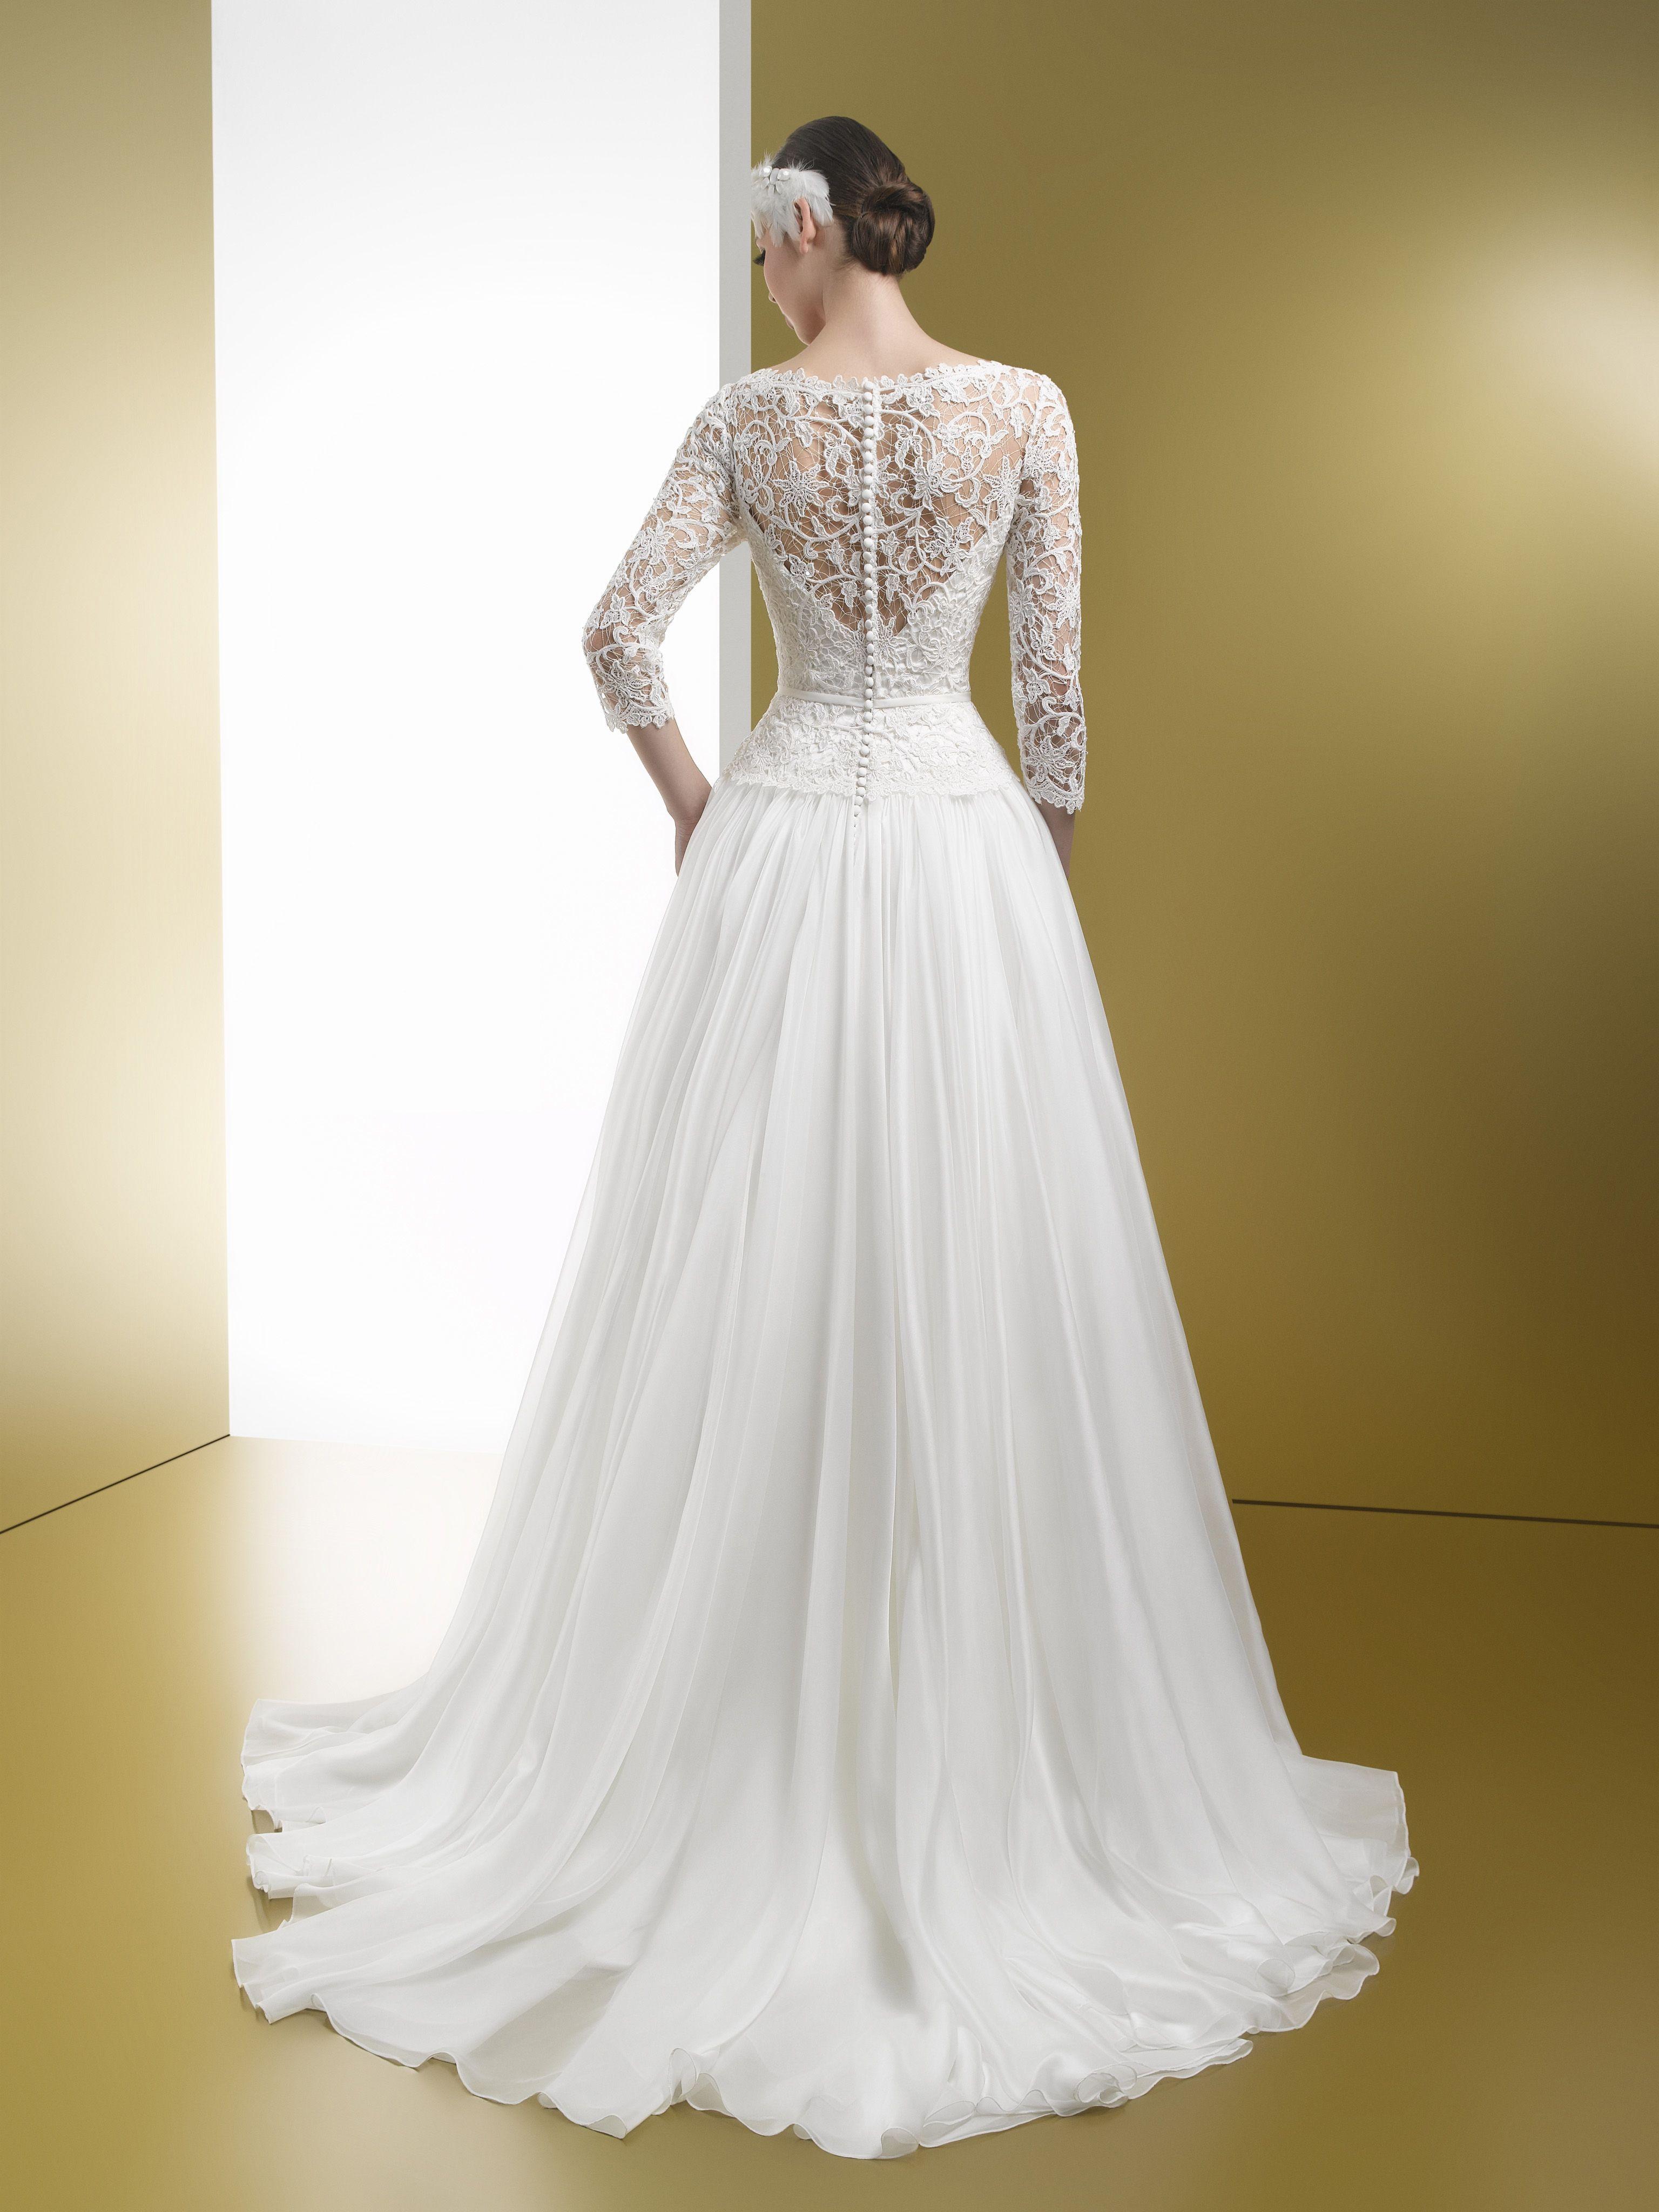 DIAMOND 3 Wedding dresses, Bridal collection 2015, Dresses